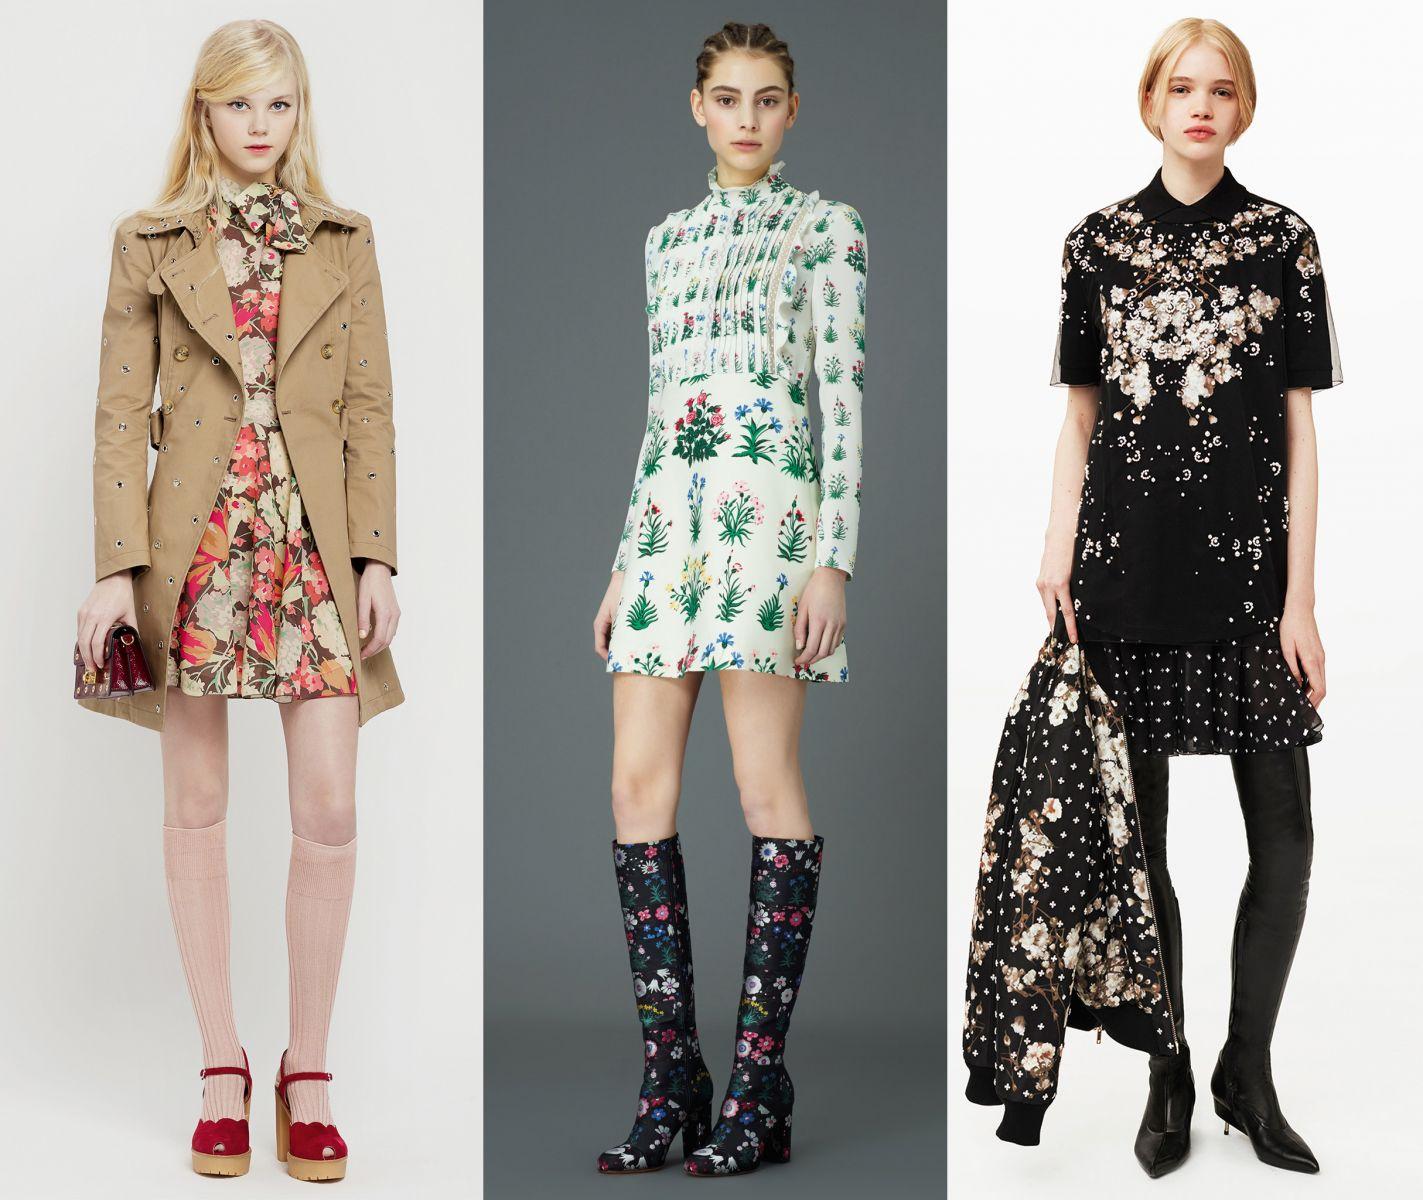 Что носить в 2015 году: тенденции pre-fall - фото №4